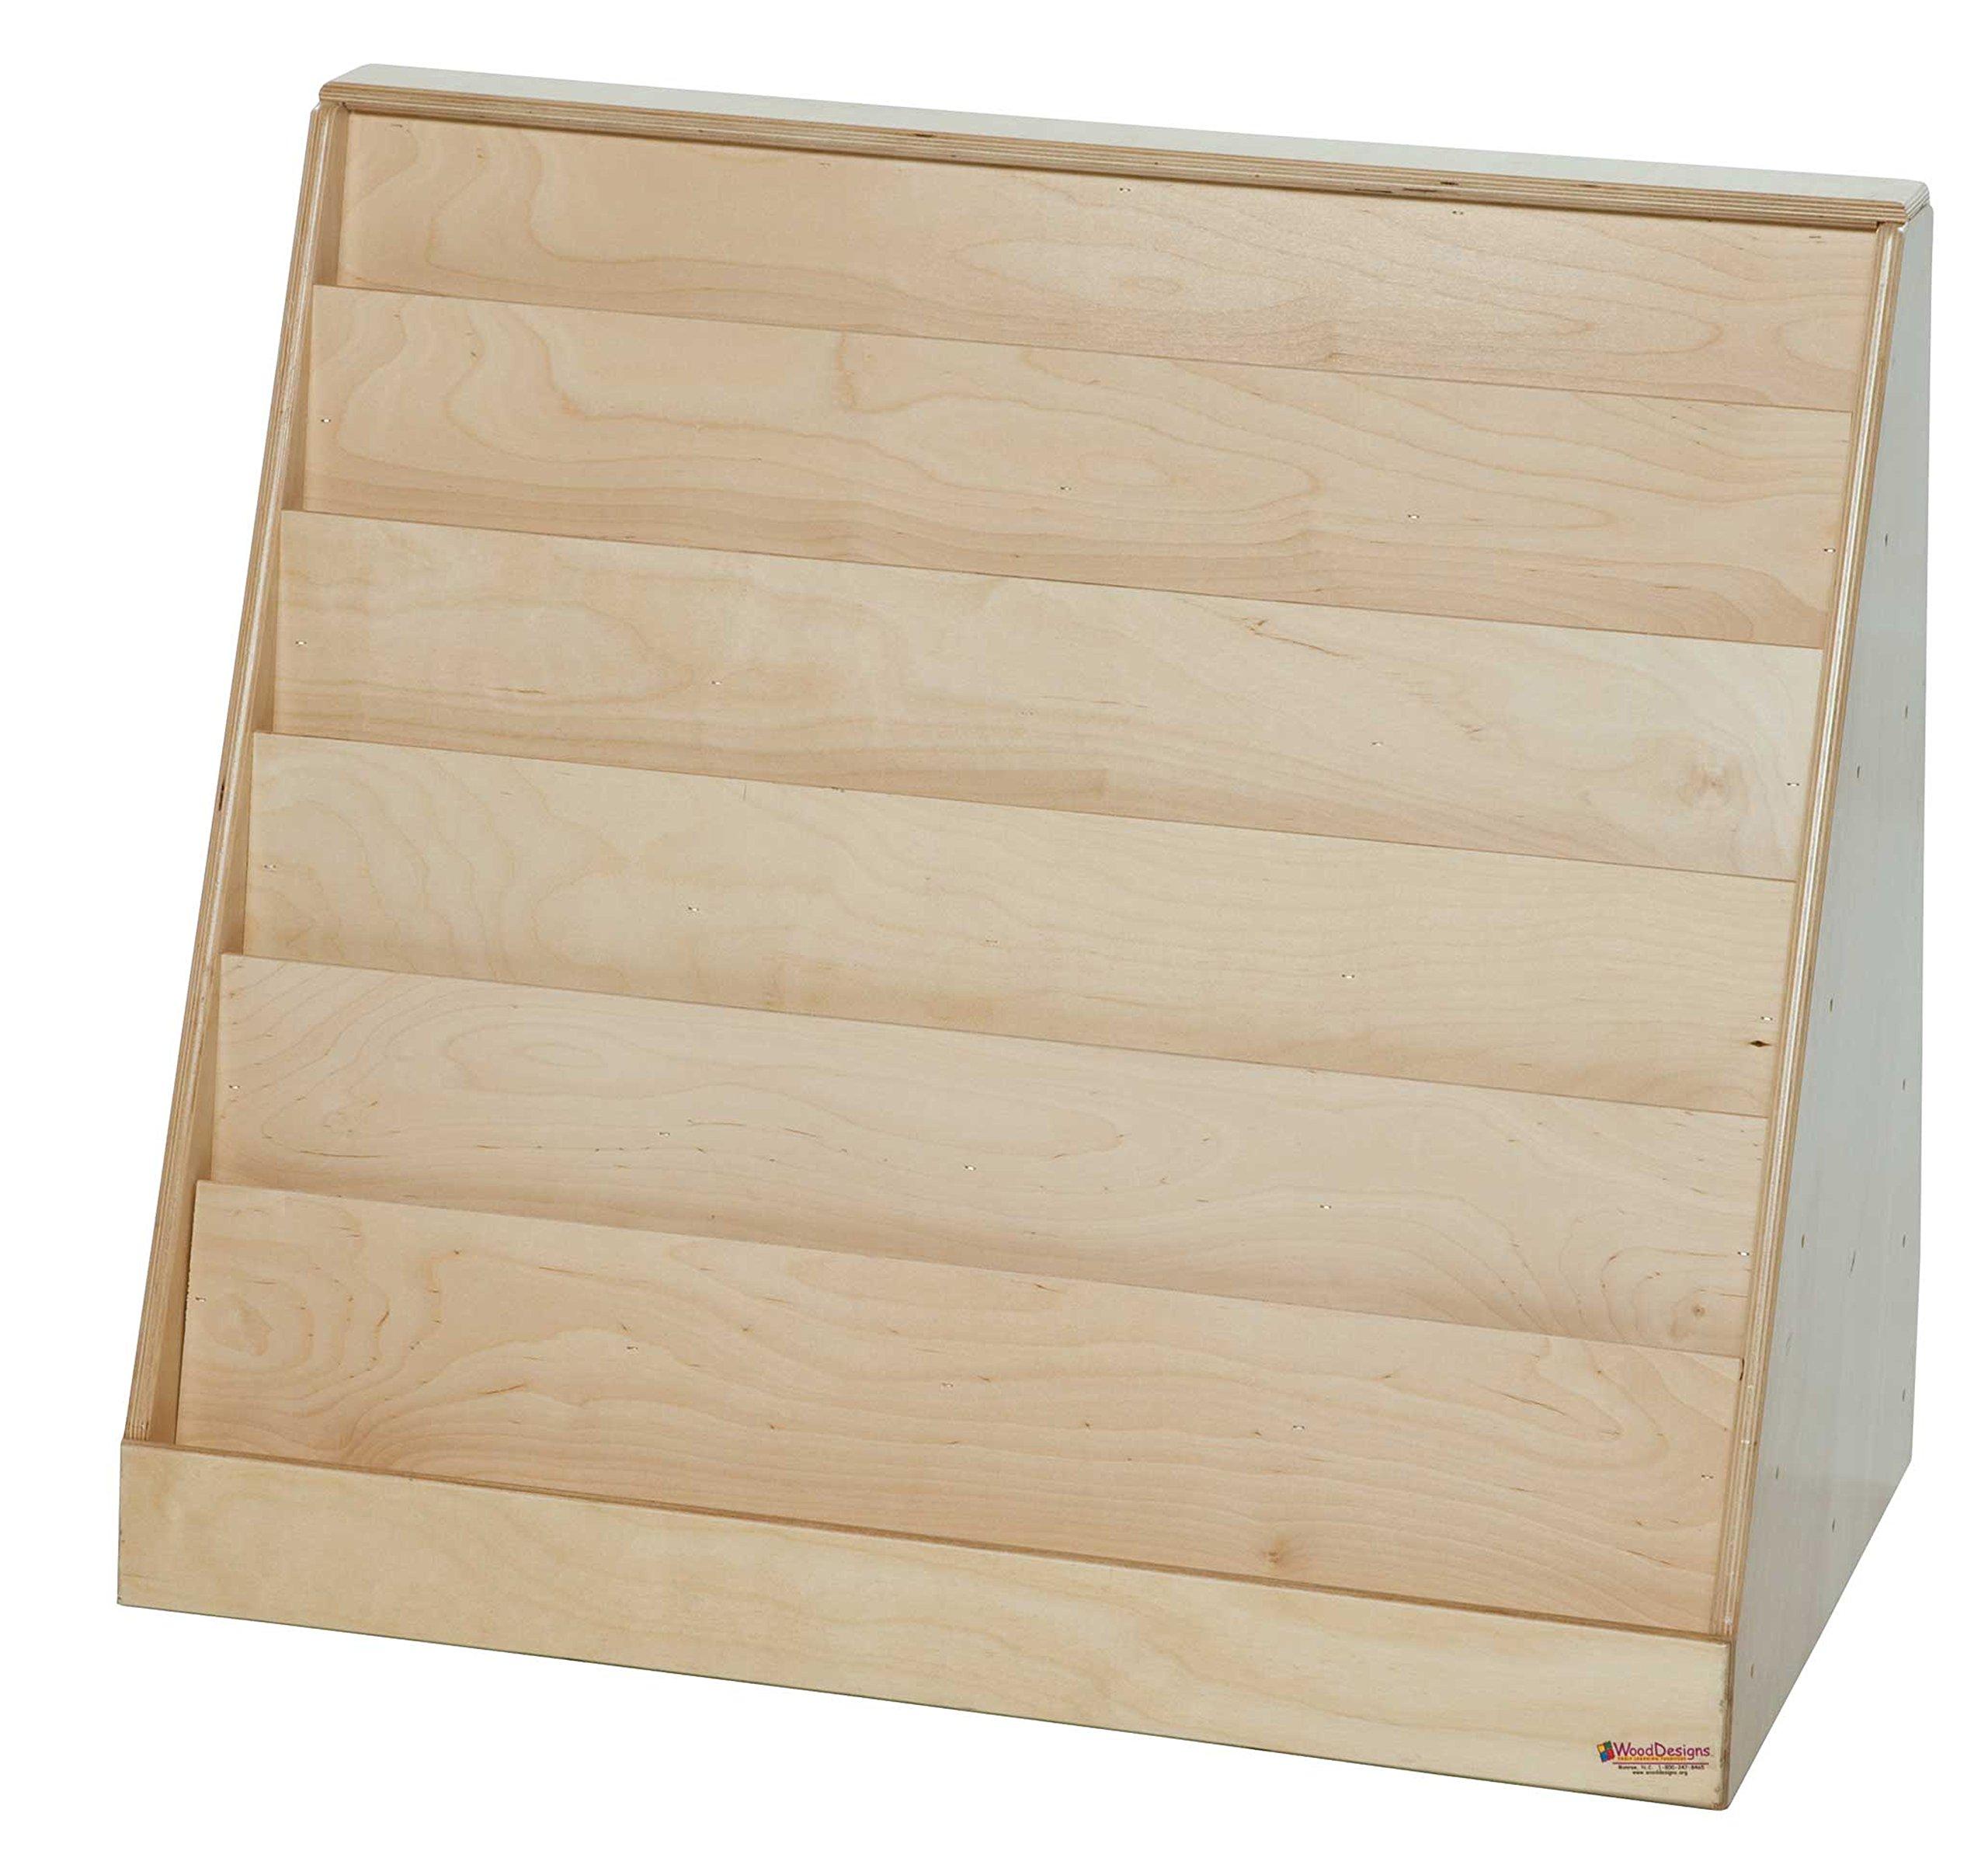 Wood Designs WD35000 Book Storage and Display, 30 x 30 x 25'' (H x W x D)